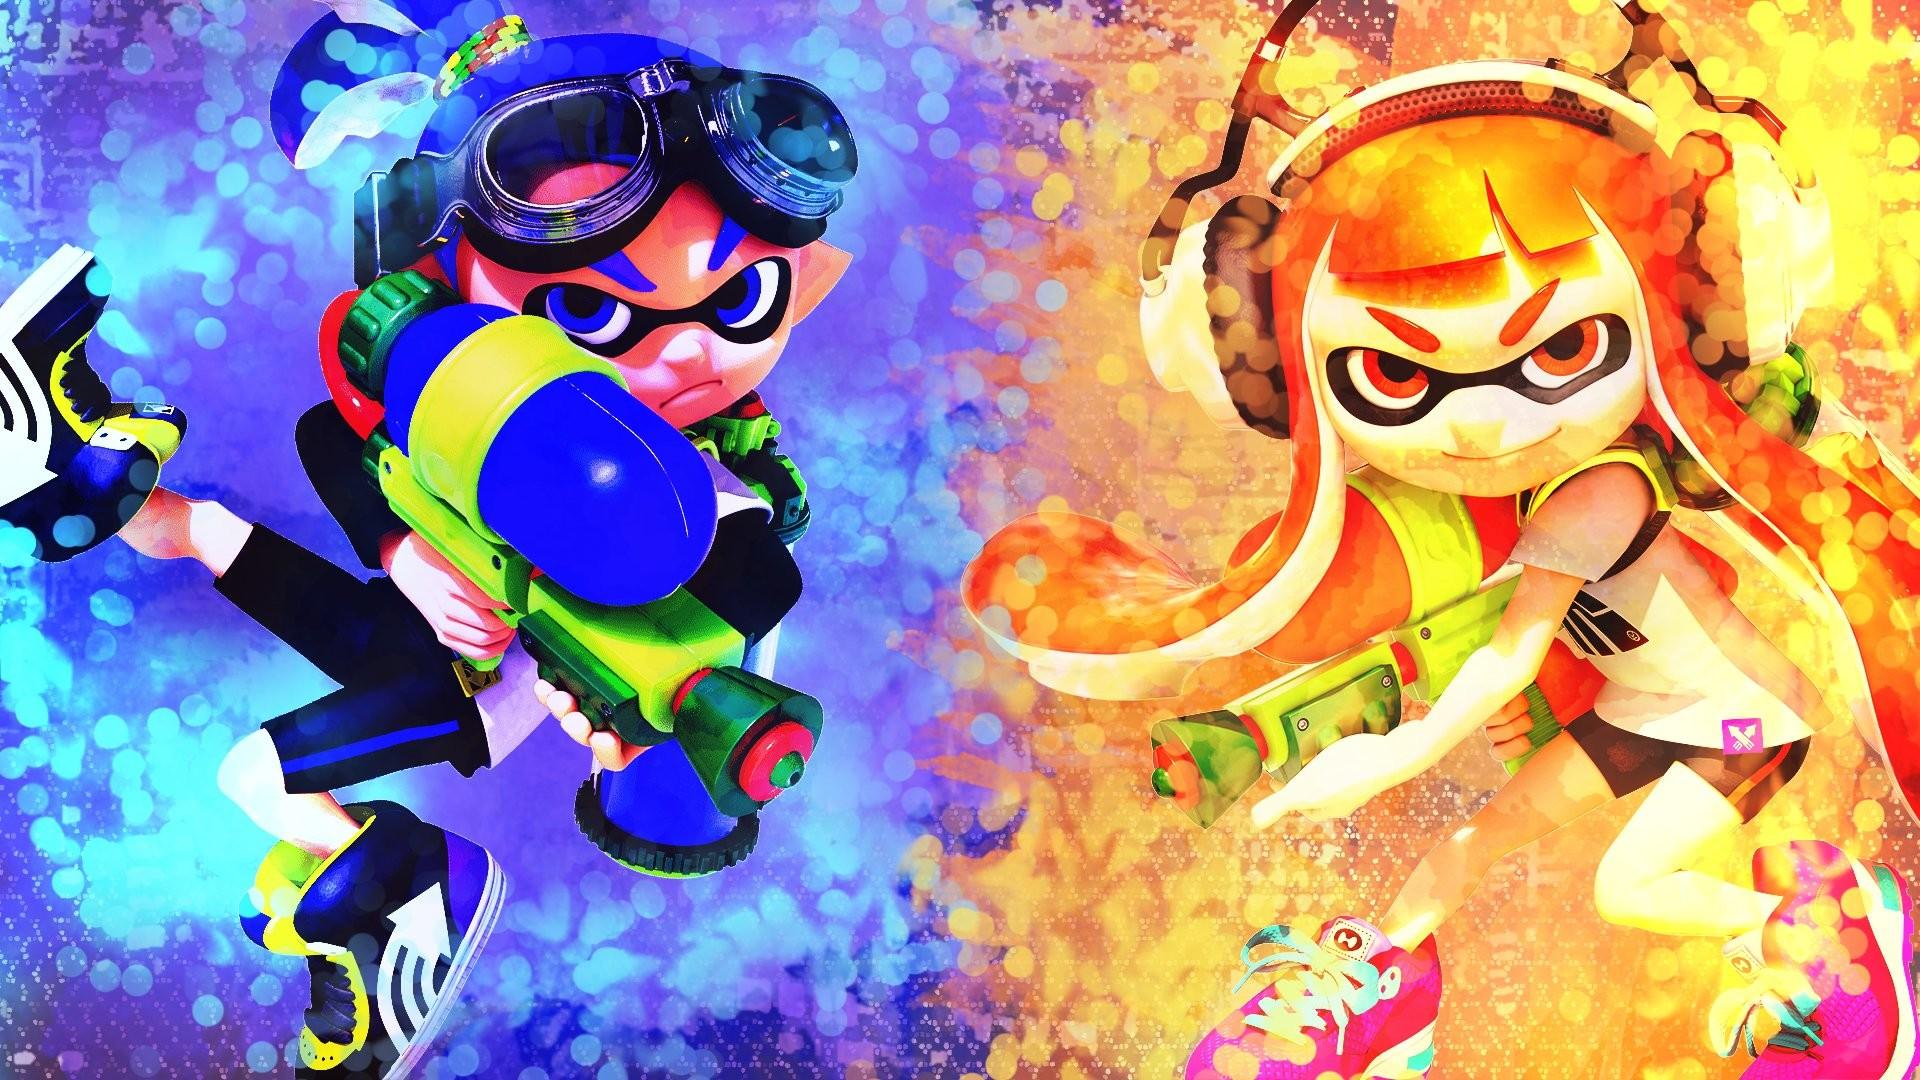 Video Game – Splatoon Inkling (Splatoon) Nintendo Wallpaper